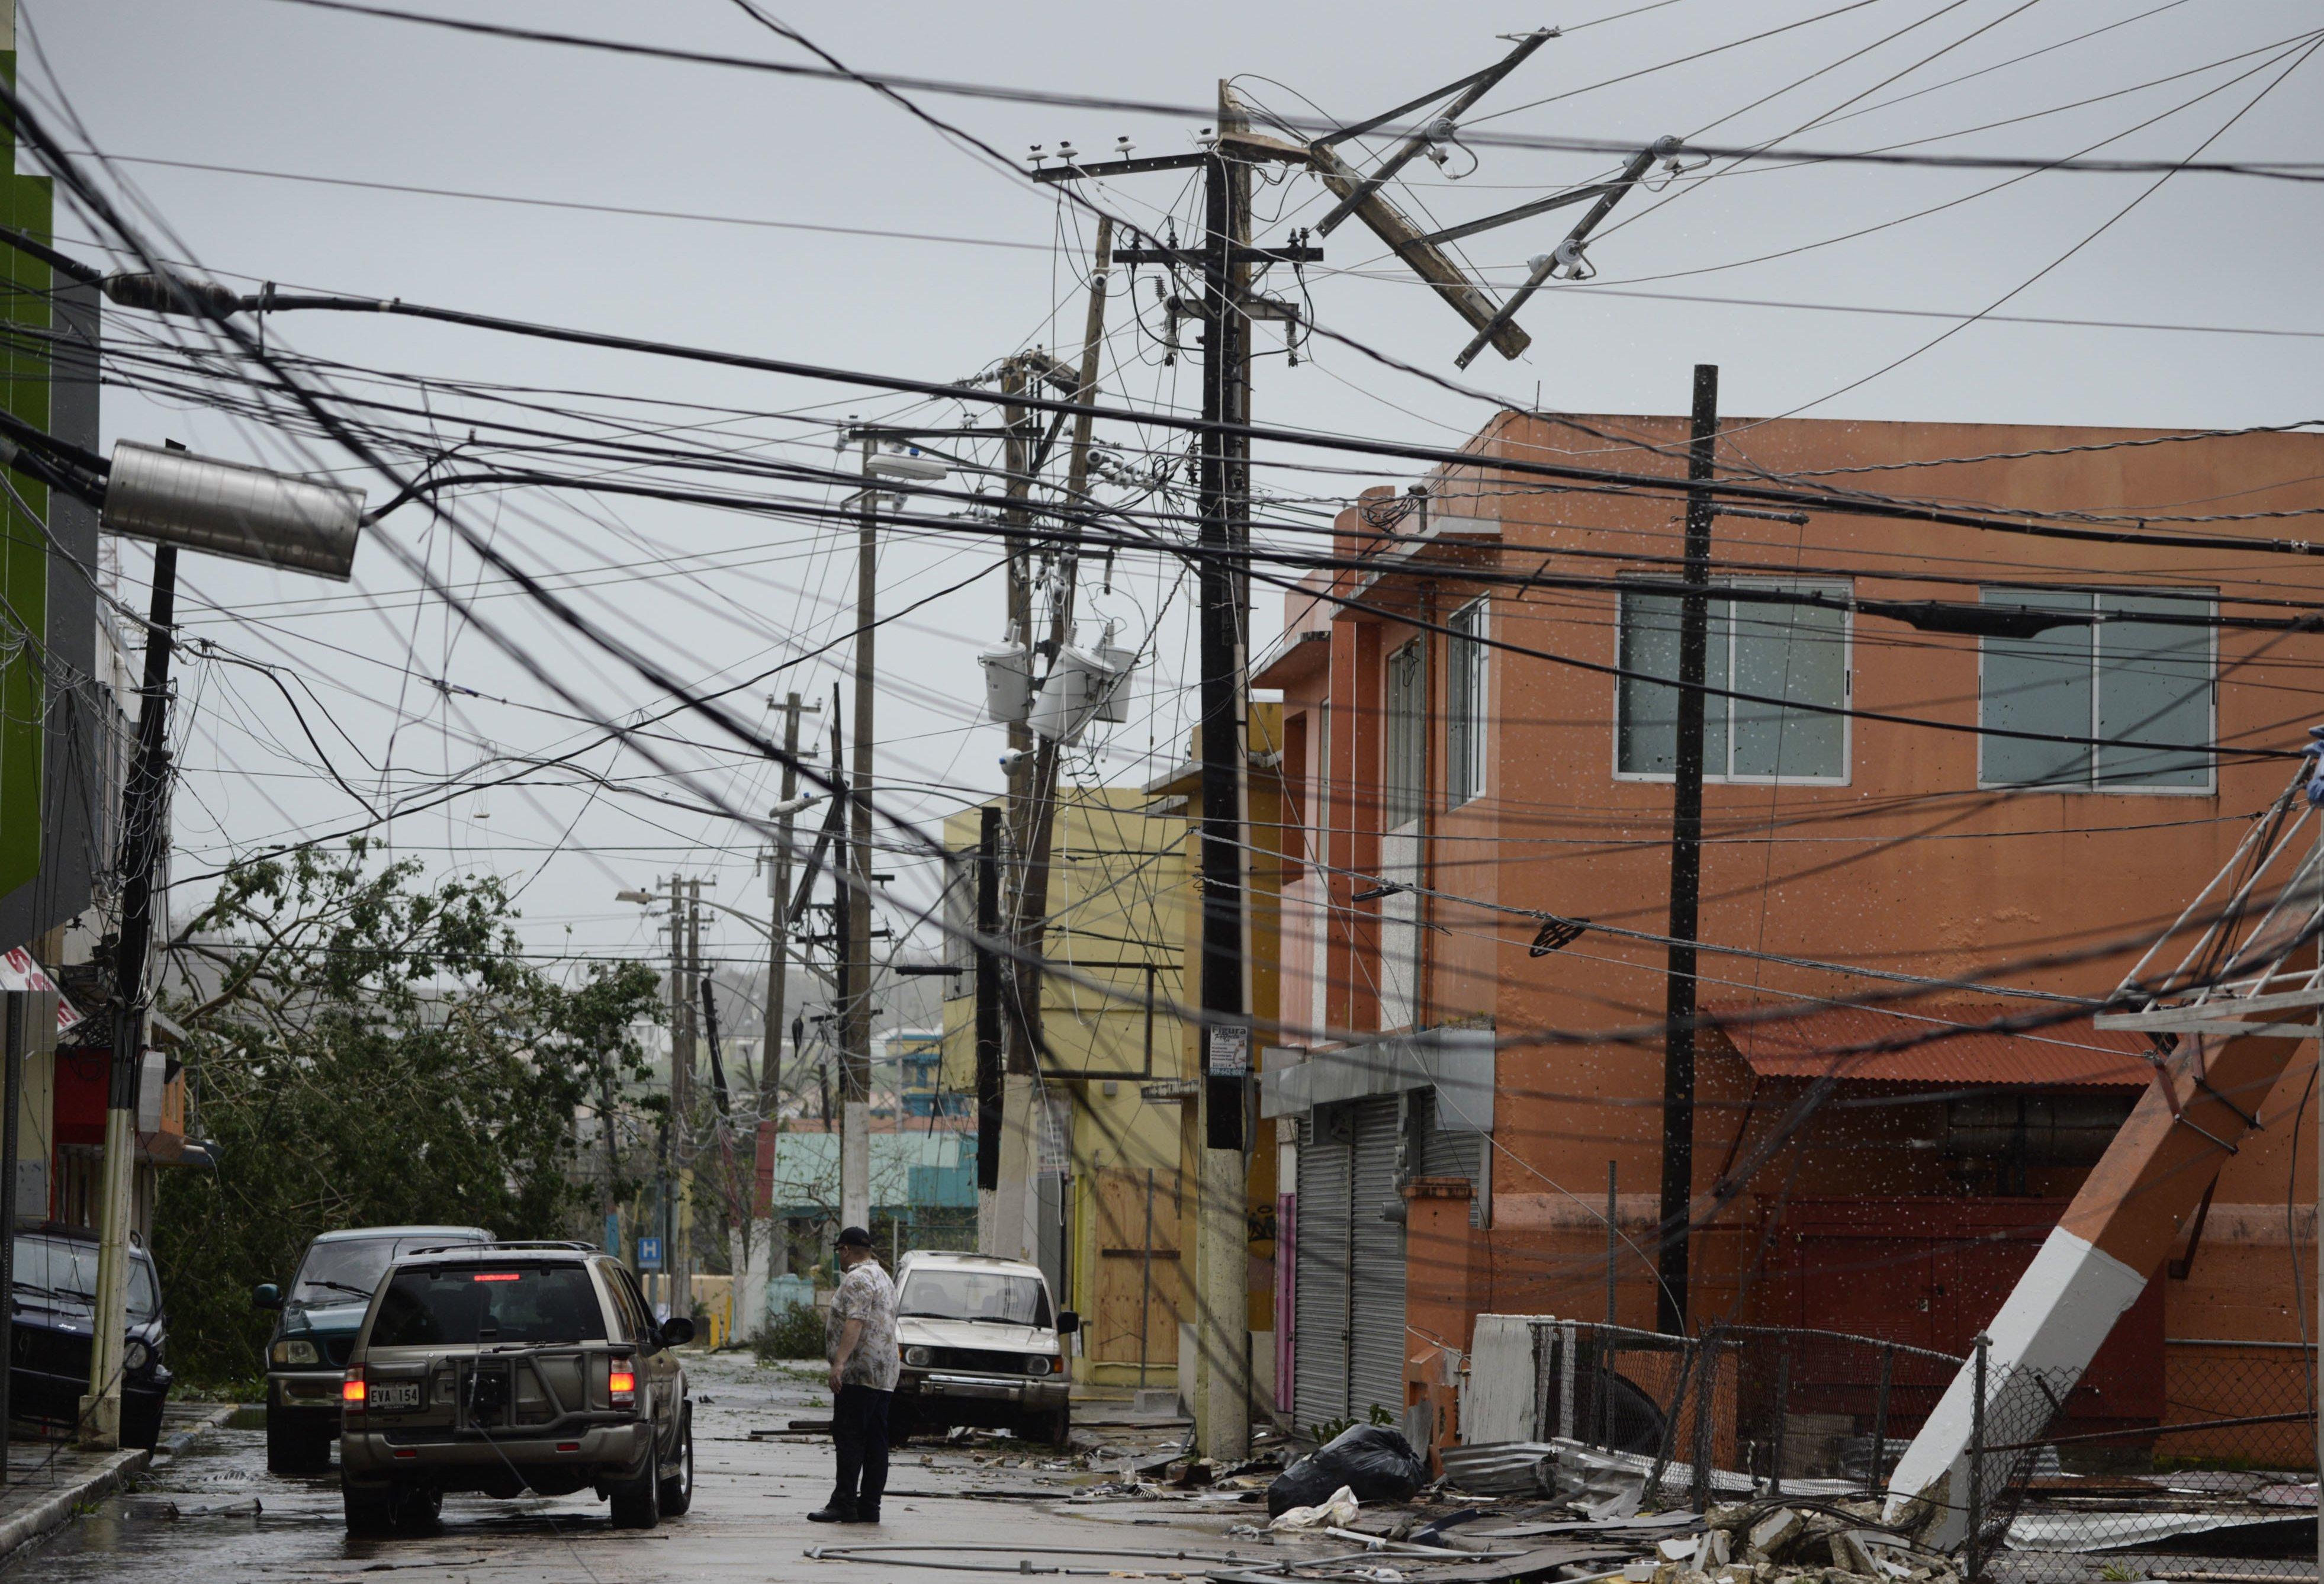 Puerto Rico advierte que registrará falta de liquidez a fin de año por ciclón